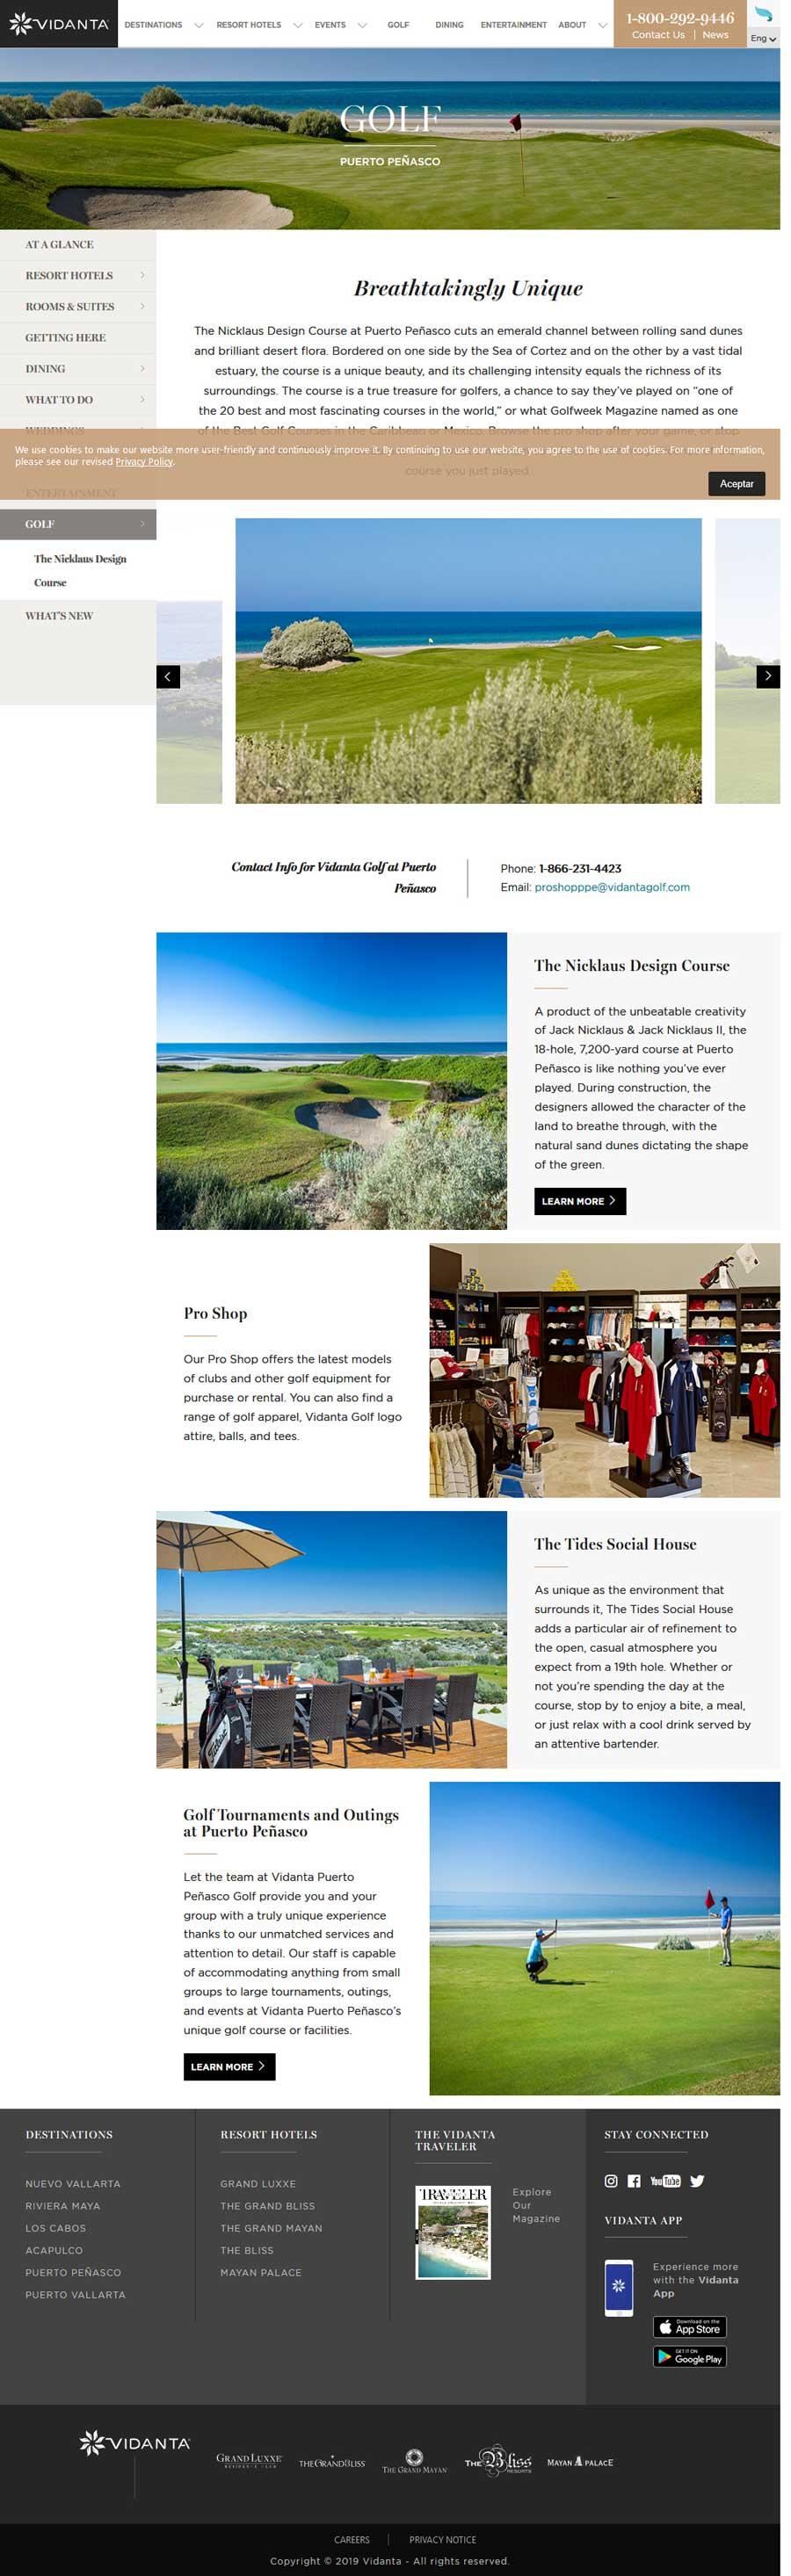 Vidanta Golf in Rocky Point Mexico (Puerto Penasco) Click the Picture to visit Vidanta's Golf Website.